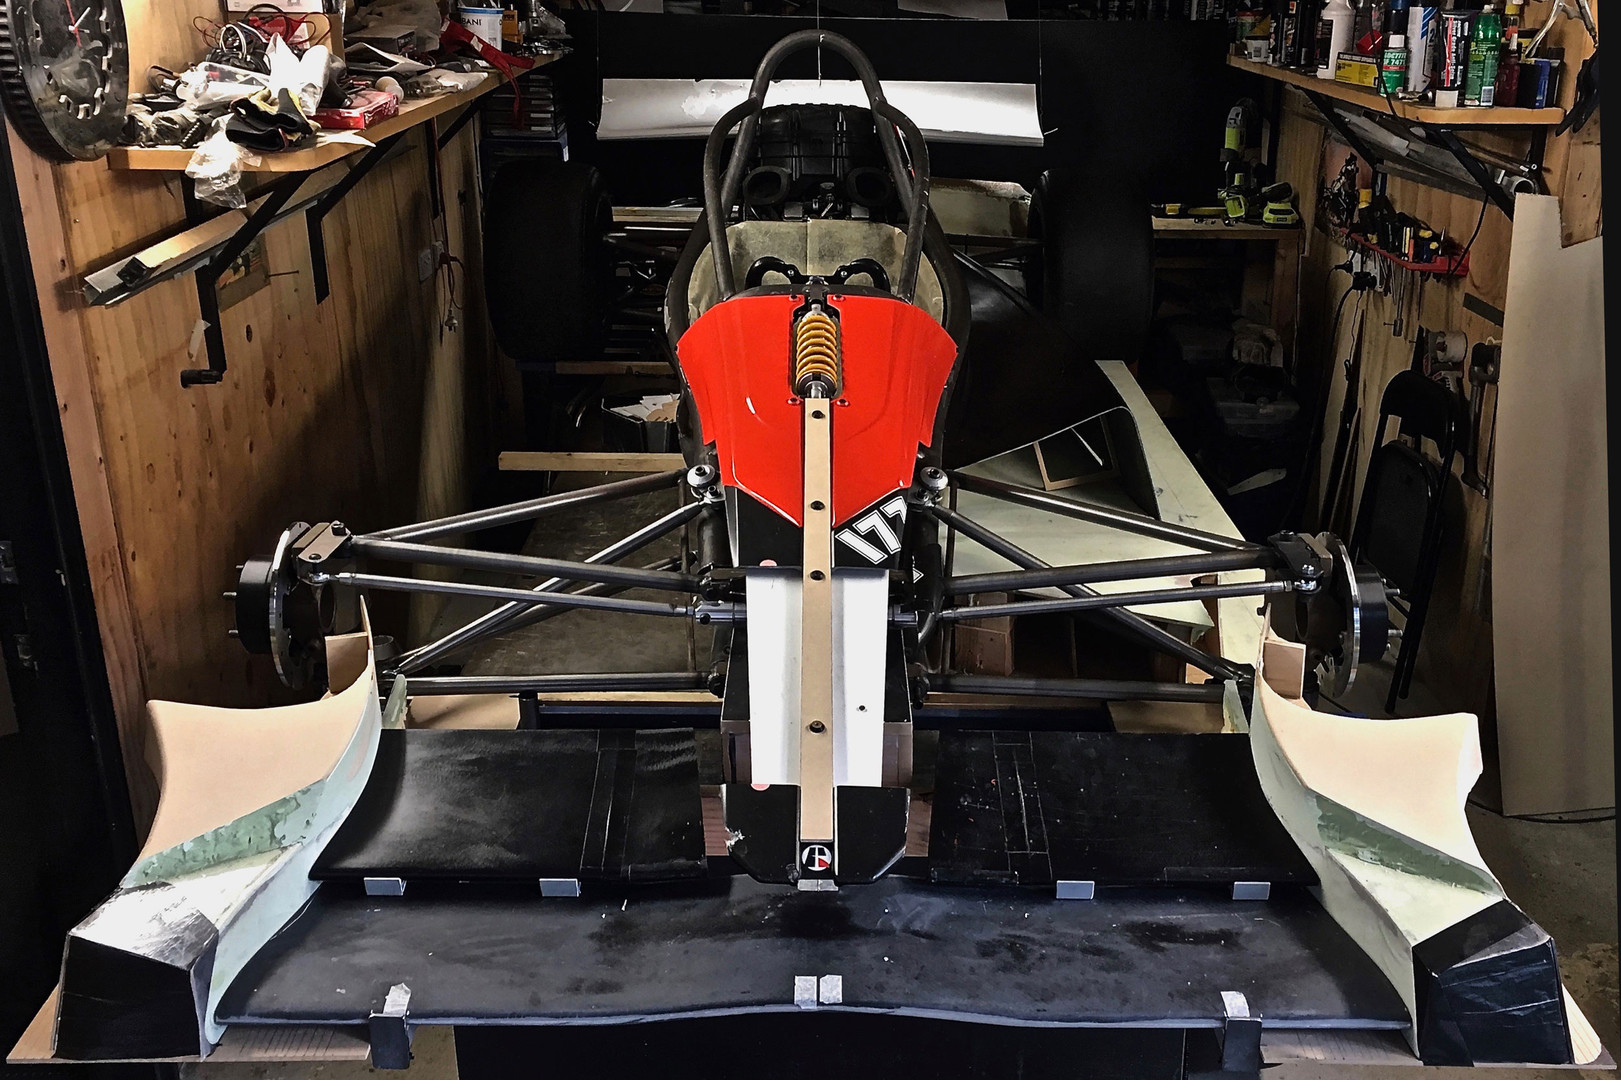 HX1R-mock-up-front-mod-2500.jpg